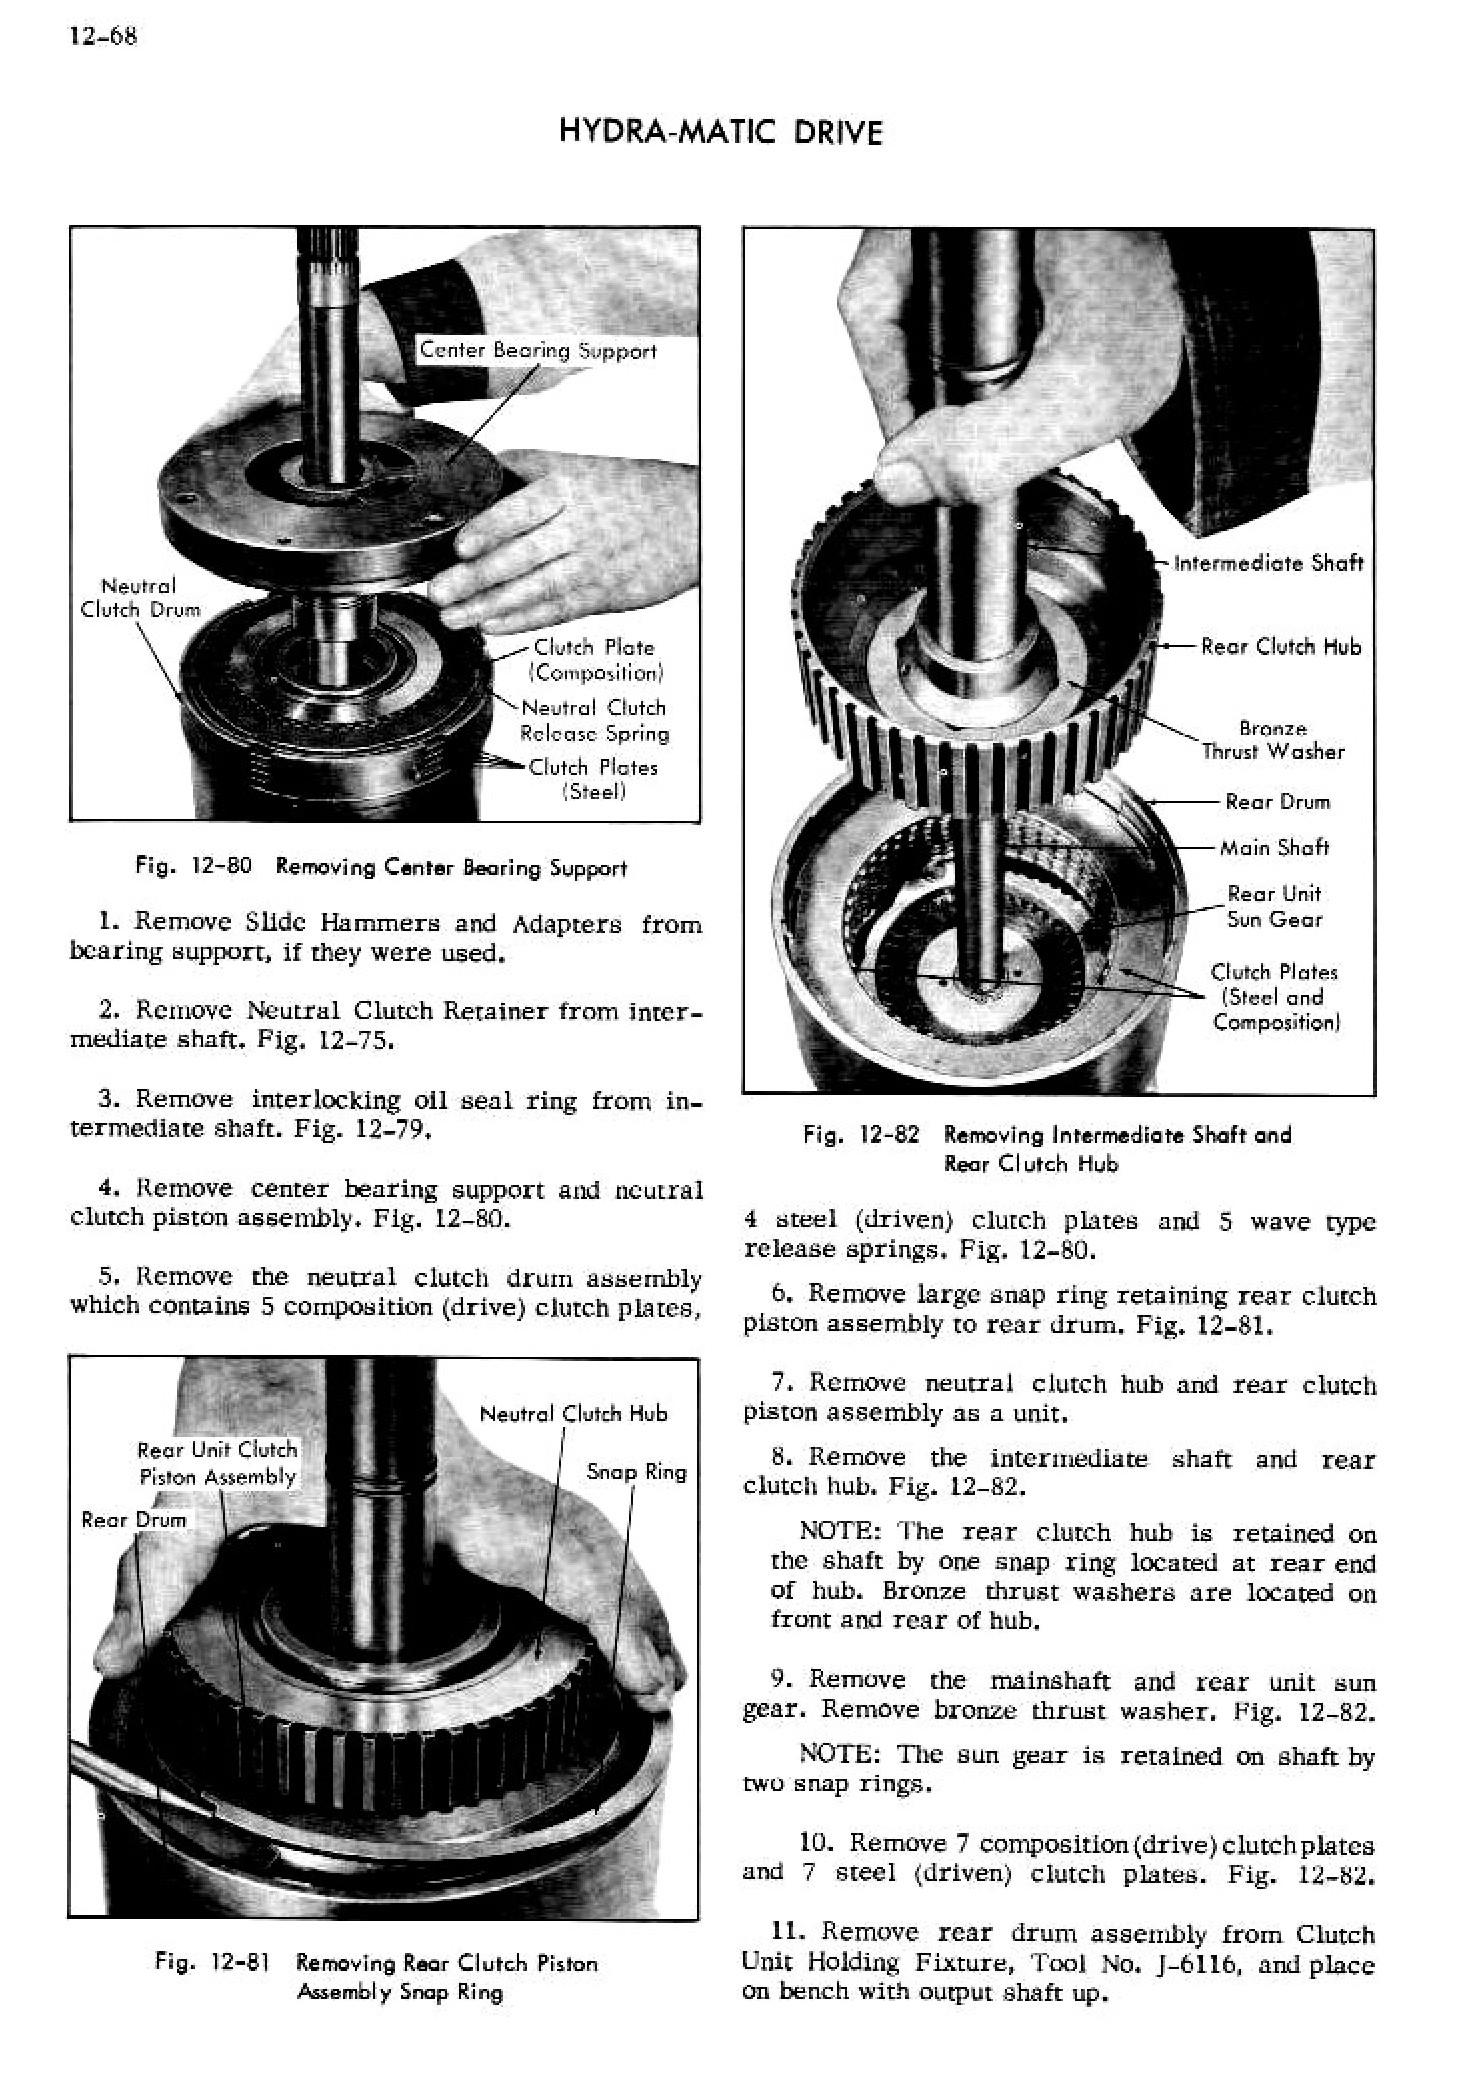 1956 Cadillac Shop Manual- Hydra-Matic Page 68 of 94